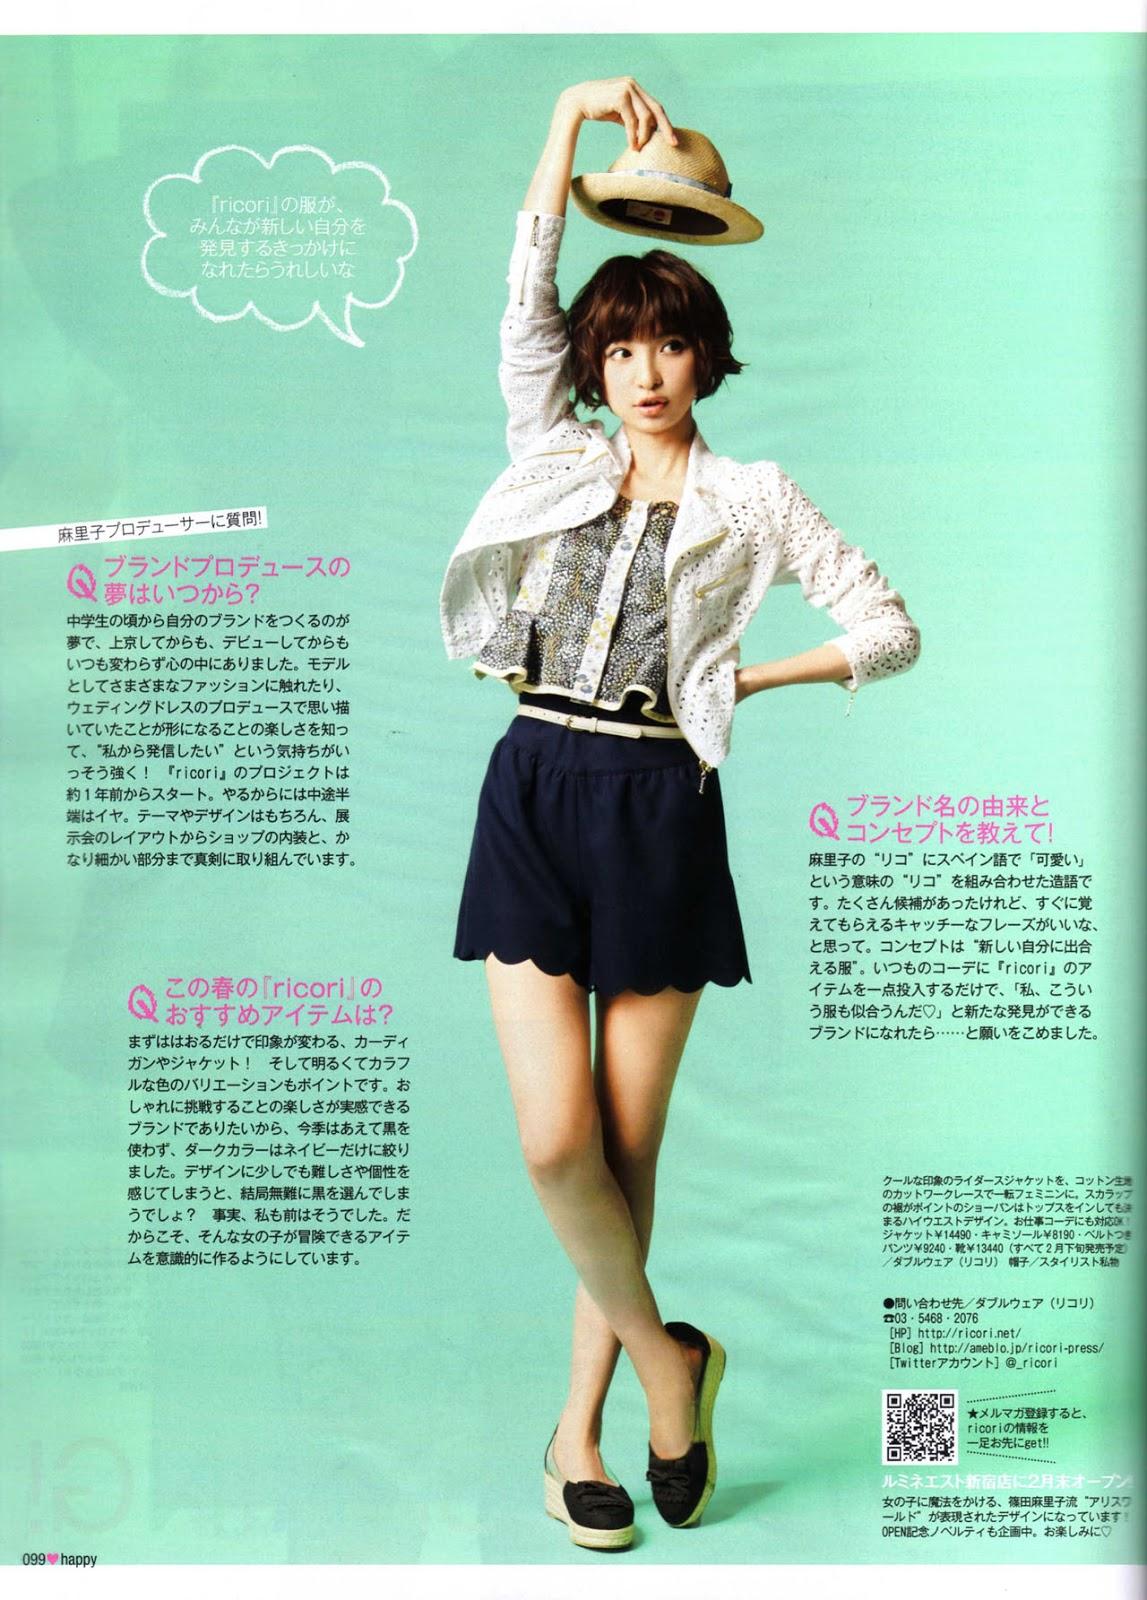 Photos Videos News: AKB48 Mariko Shinoda